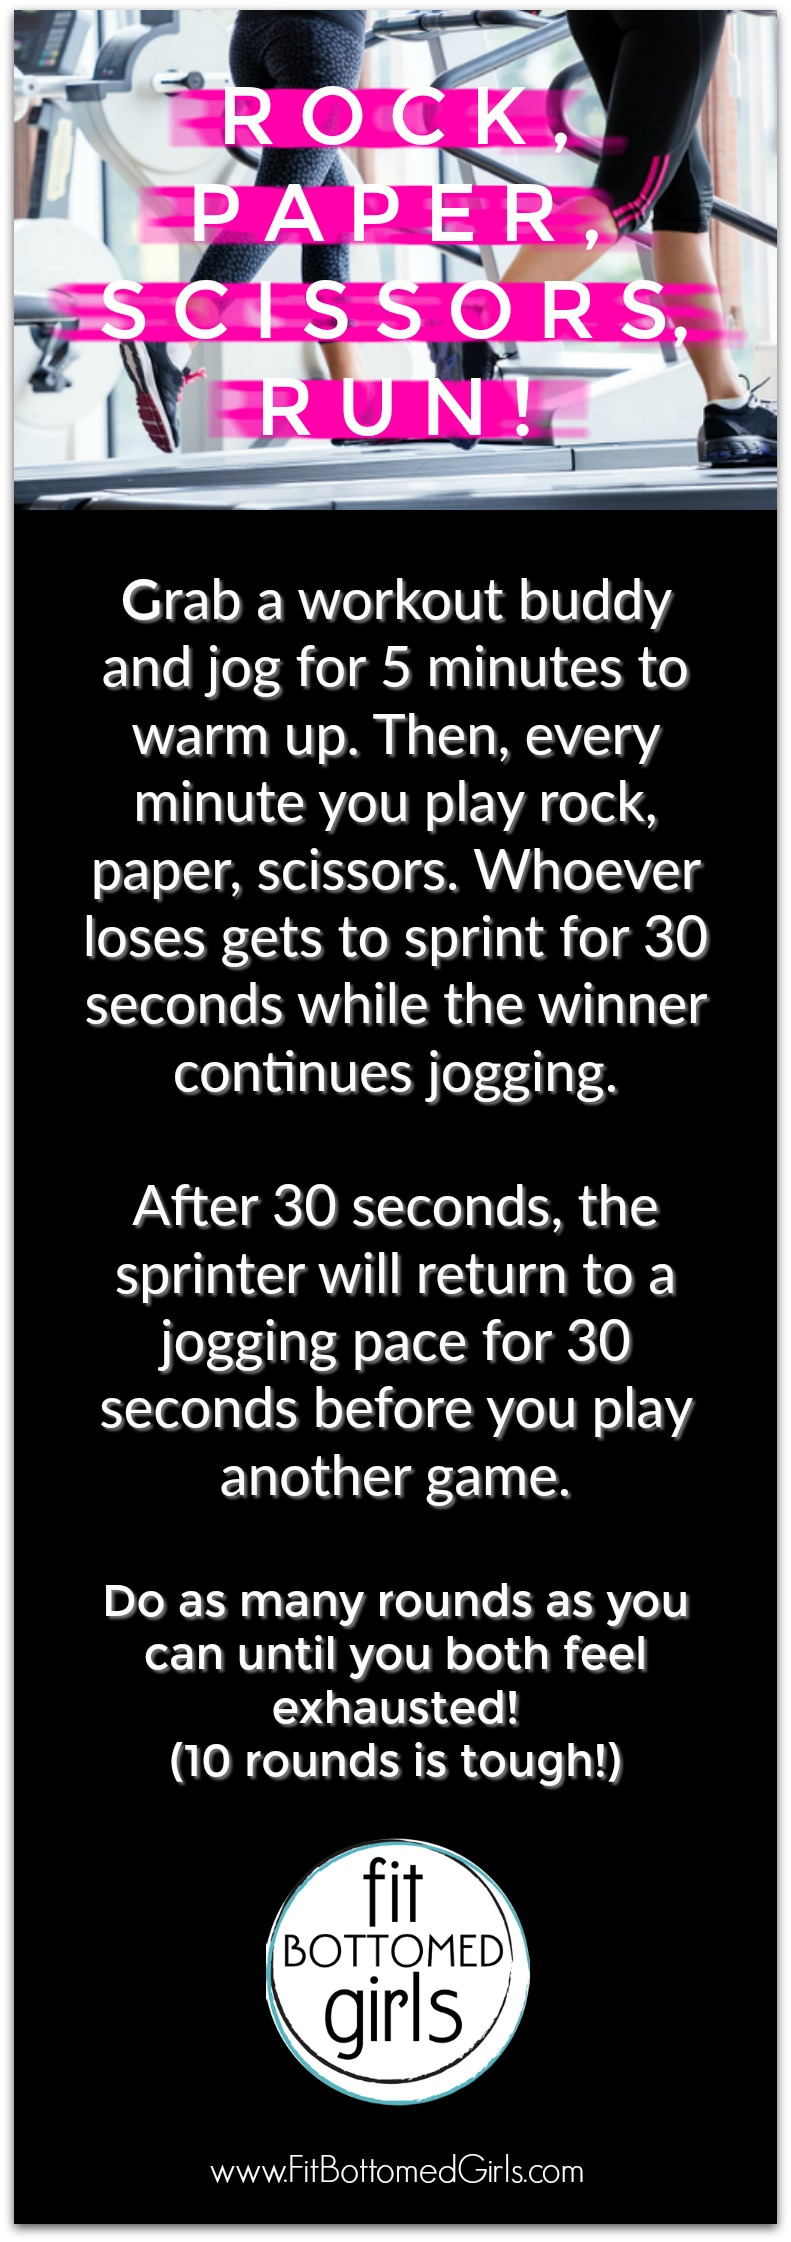 rock-paper-scissors-workout